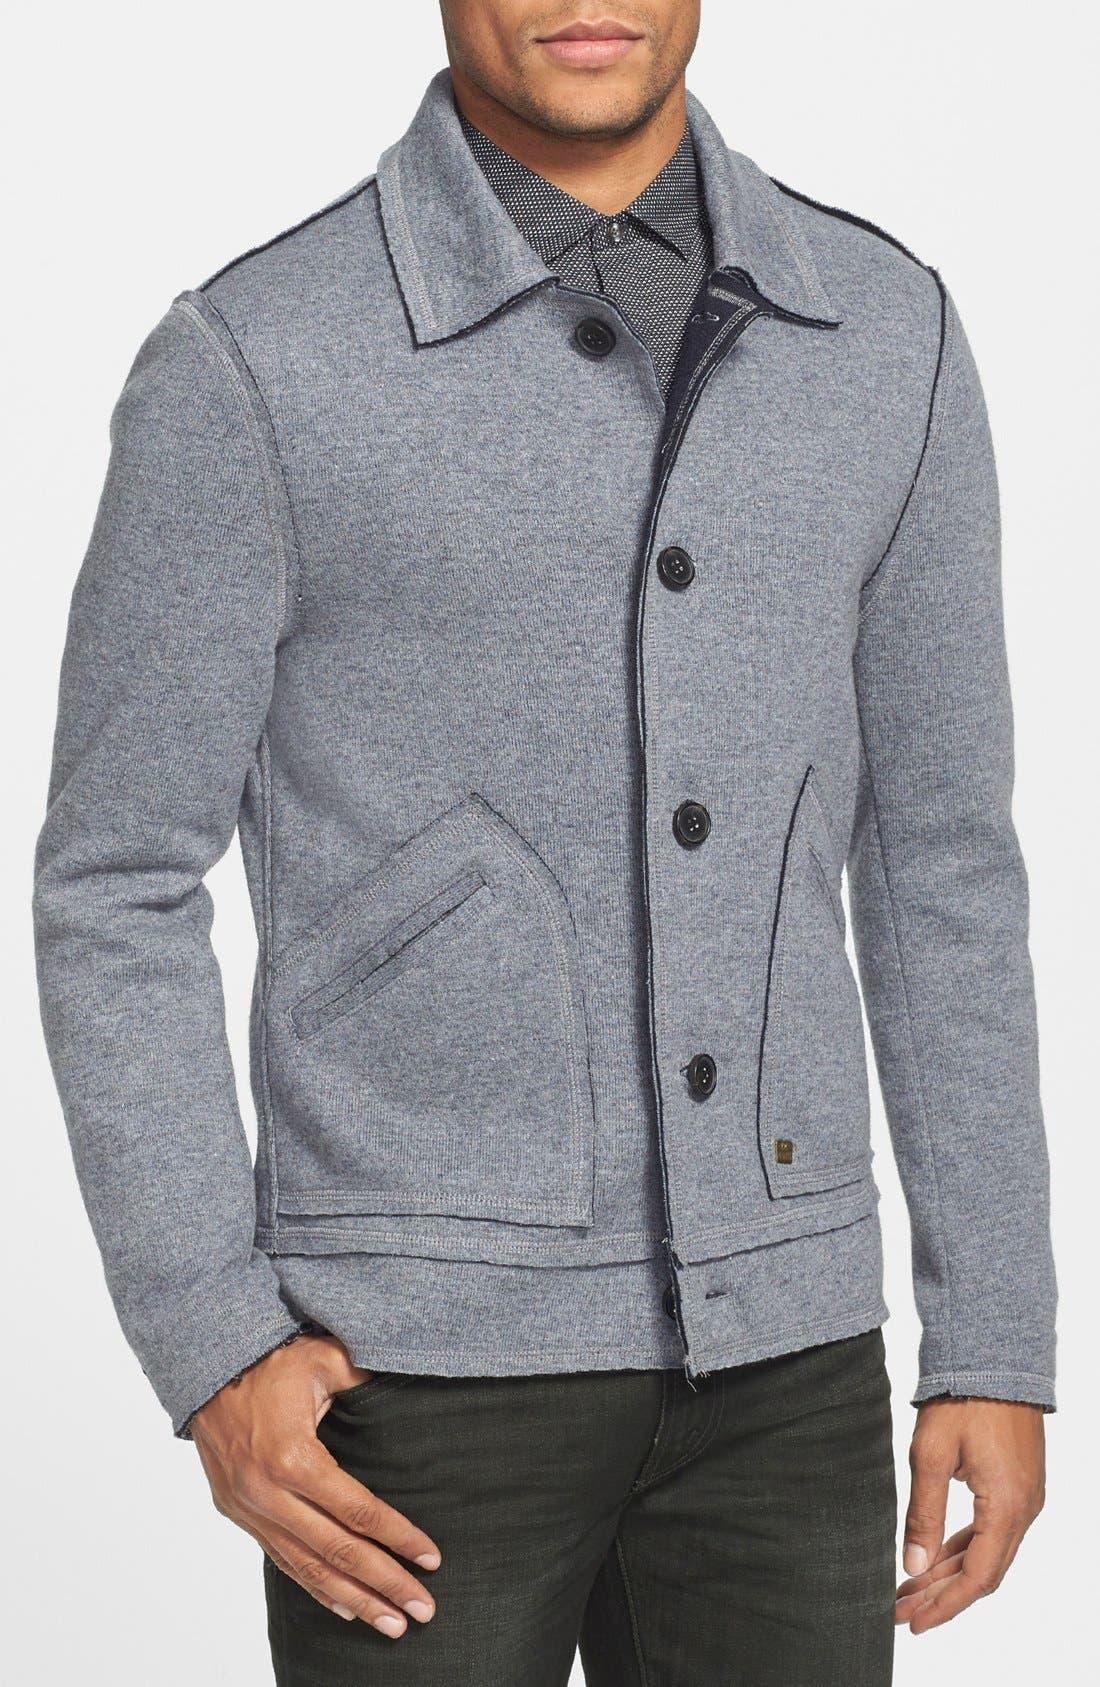 Main Image - Antony Morato Wool Blend Jacket